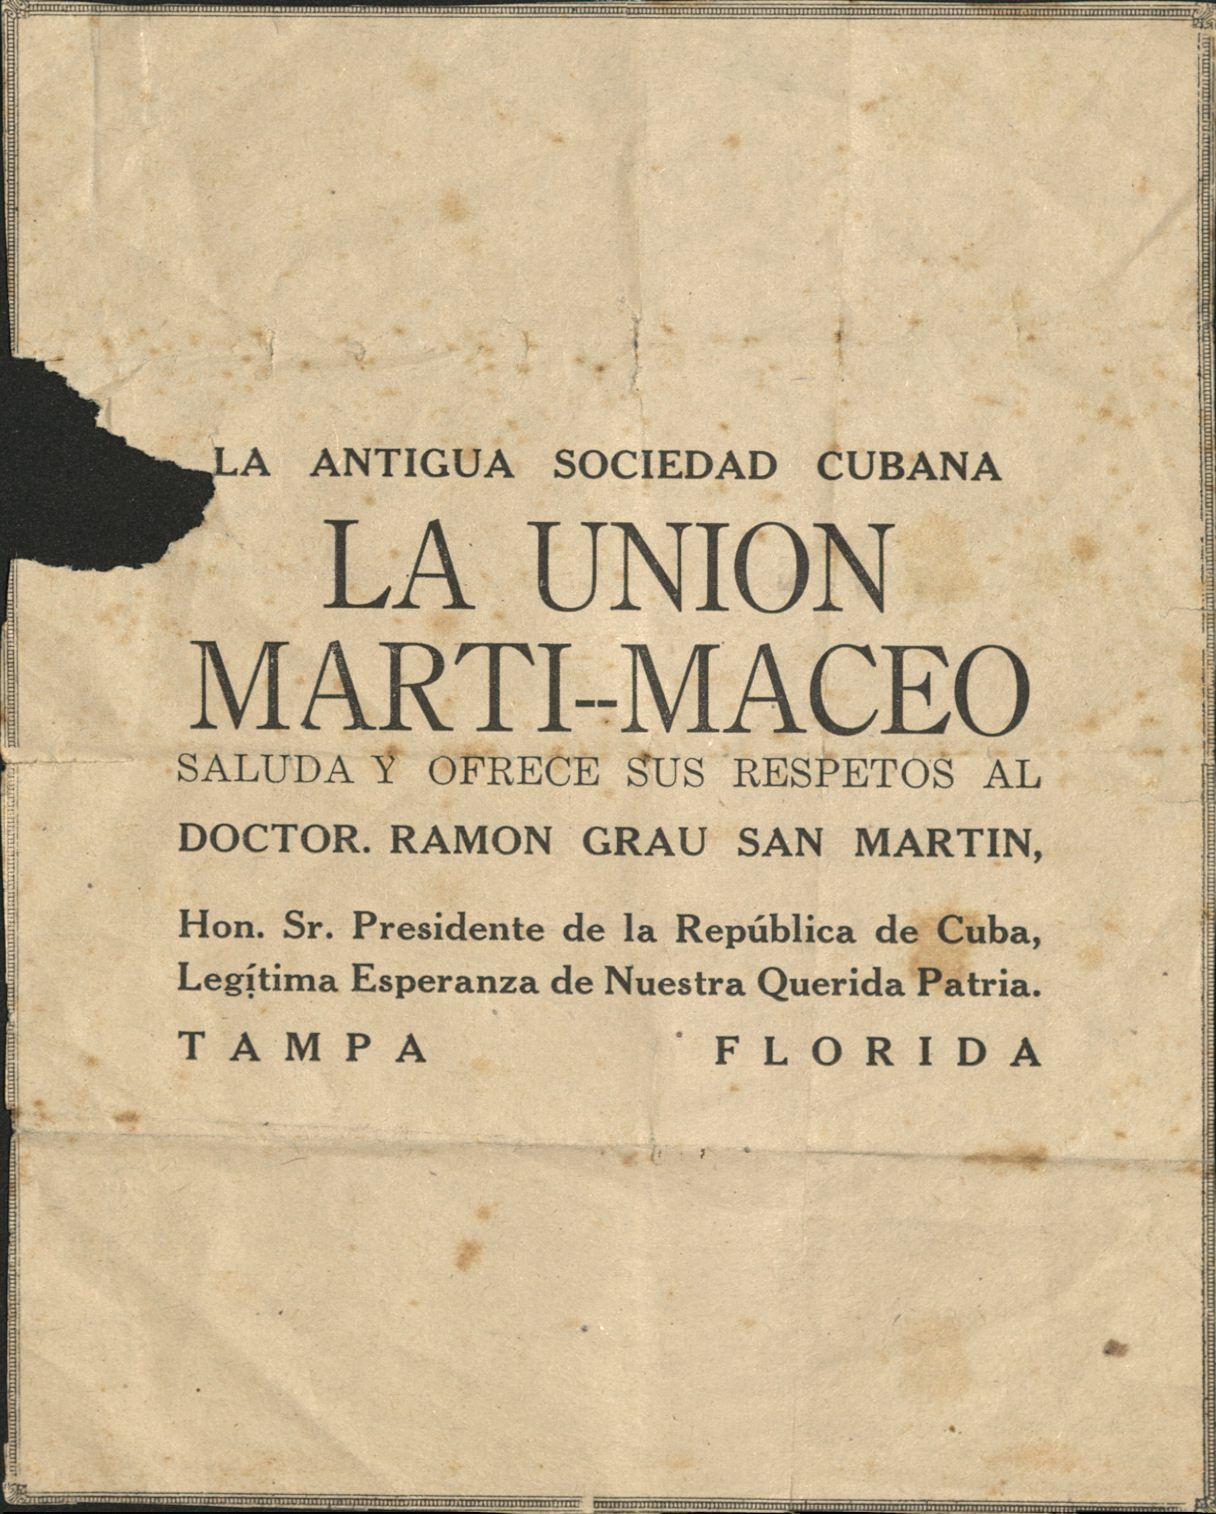 Marti-Maceo club flyer